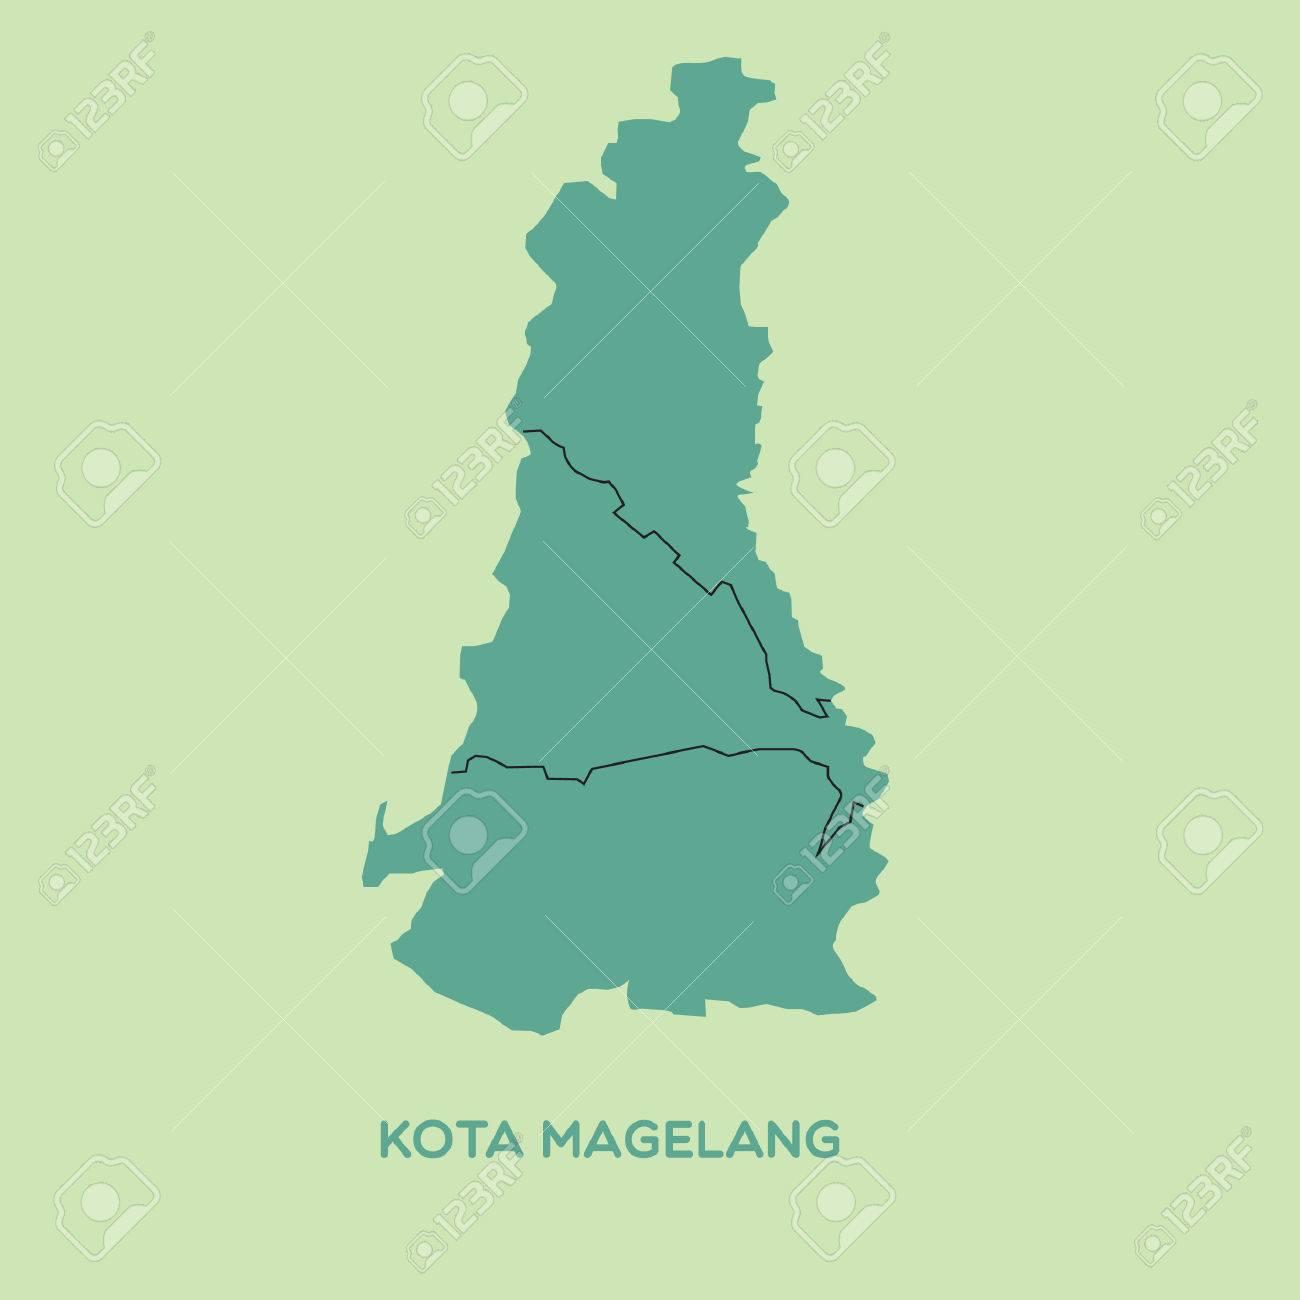 Map Of Kota Magelang Royalty Free Cliparts Vectors And Stock Illustration Image 52631803